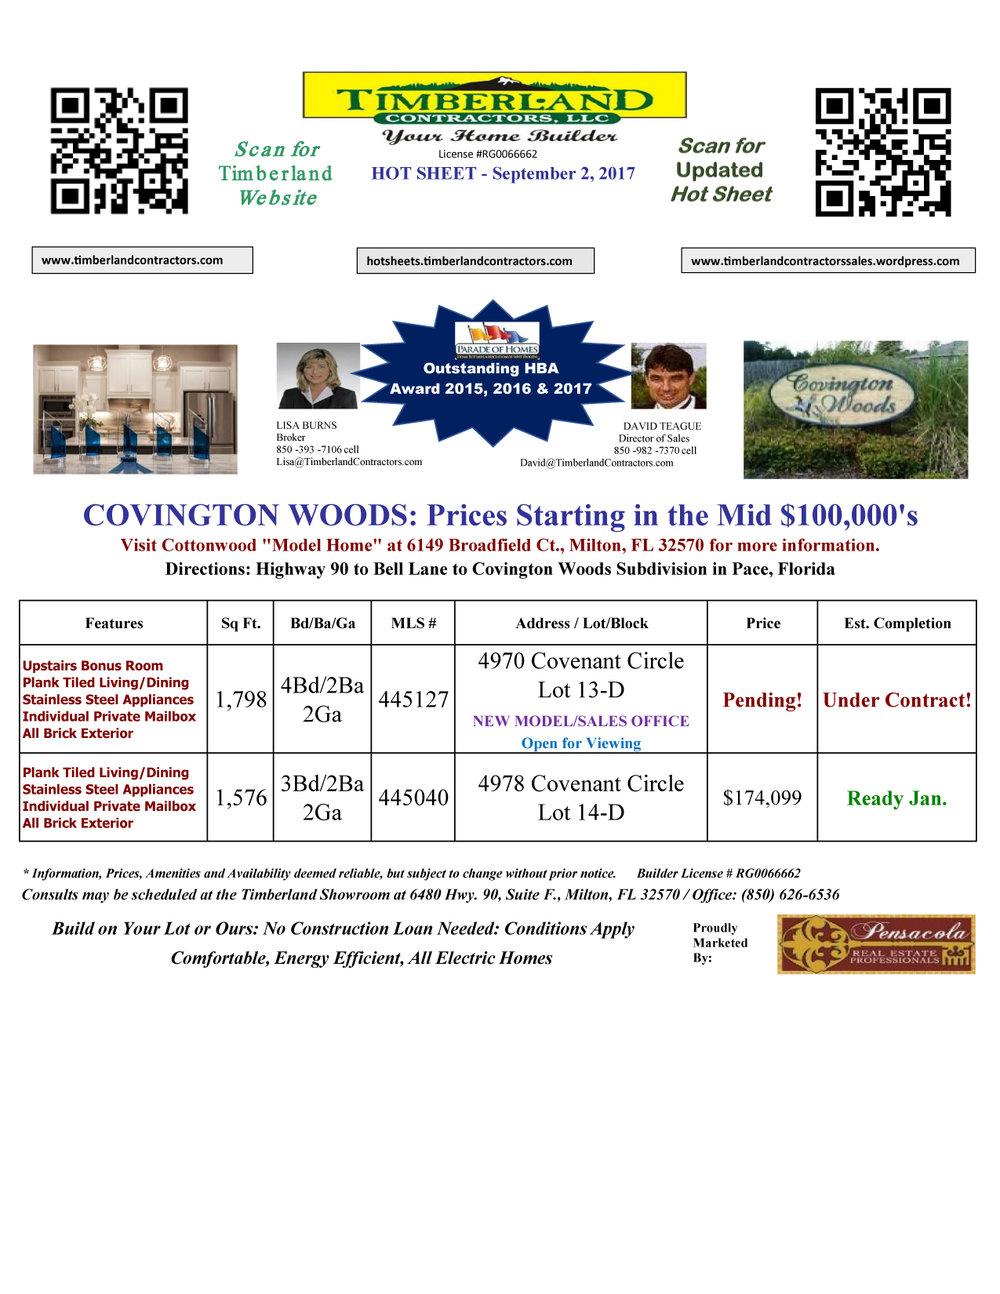 Hot Sheet Covington Woods September 2, 2017 Timberland.jpg